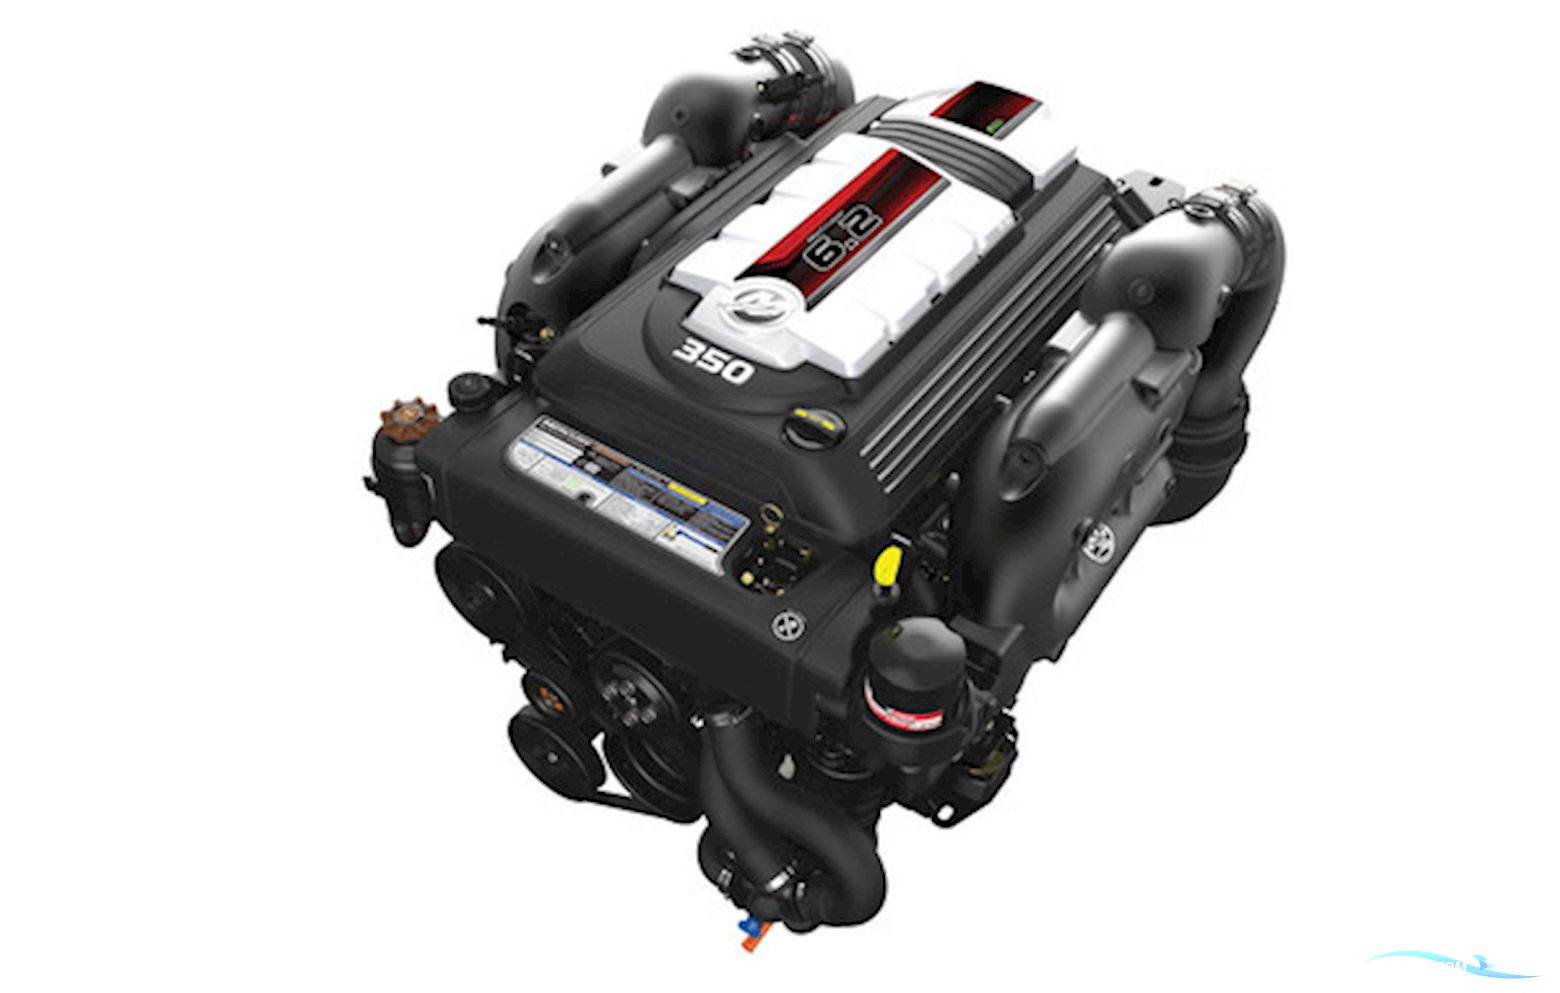 MerCruiser 6.2L 350hk Bobtail+B transom